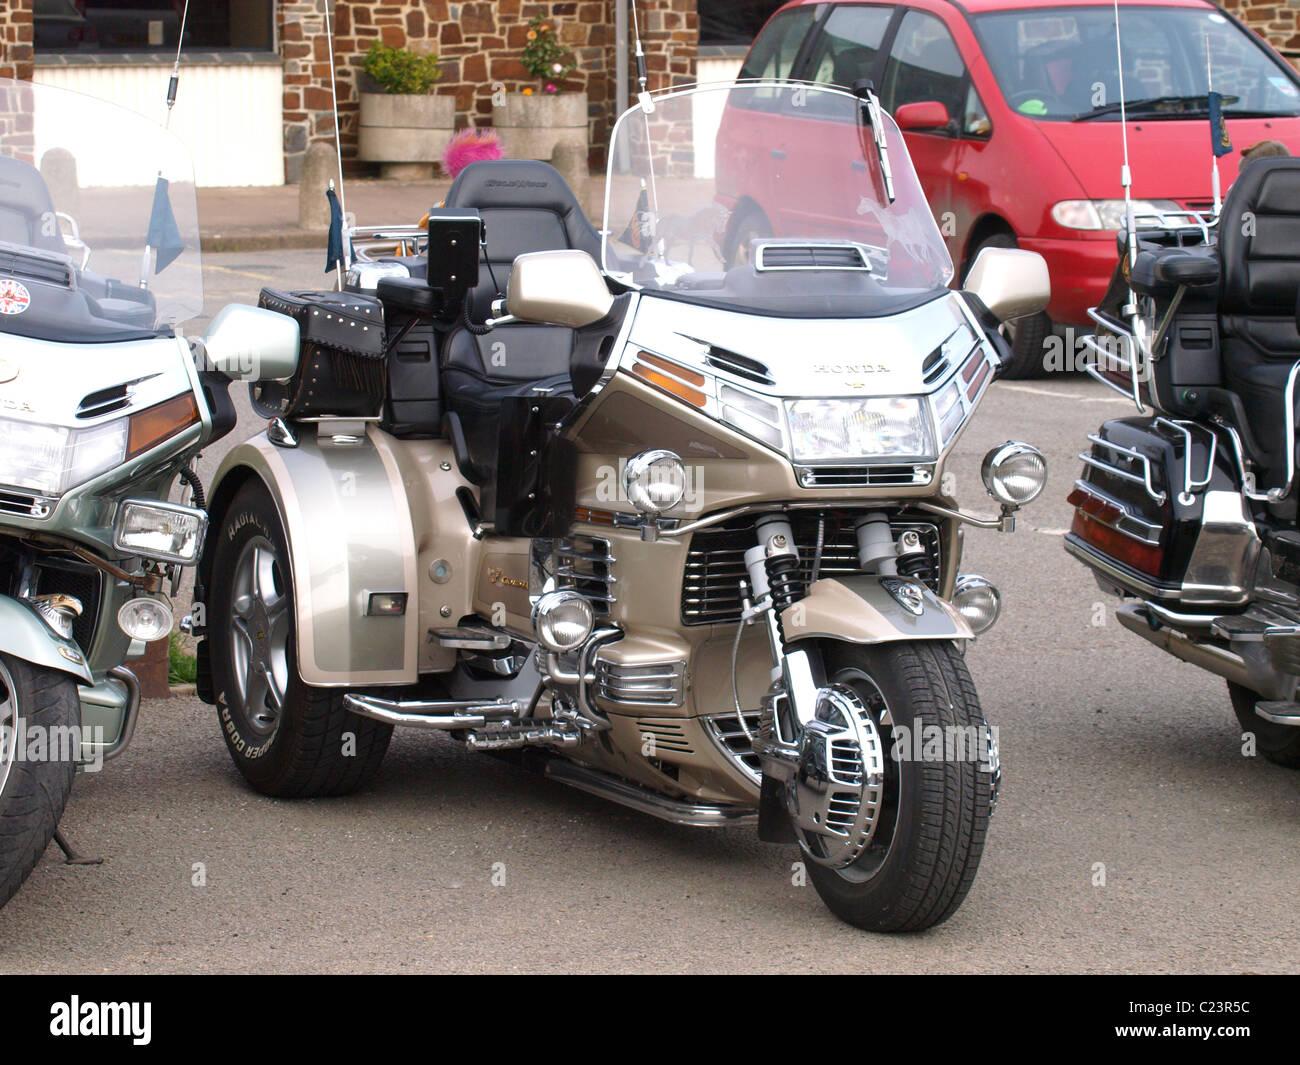 Honda Trike Stock Photos & Honda Trike Stock Images - Alamy